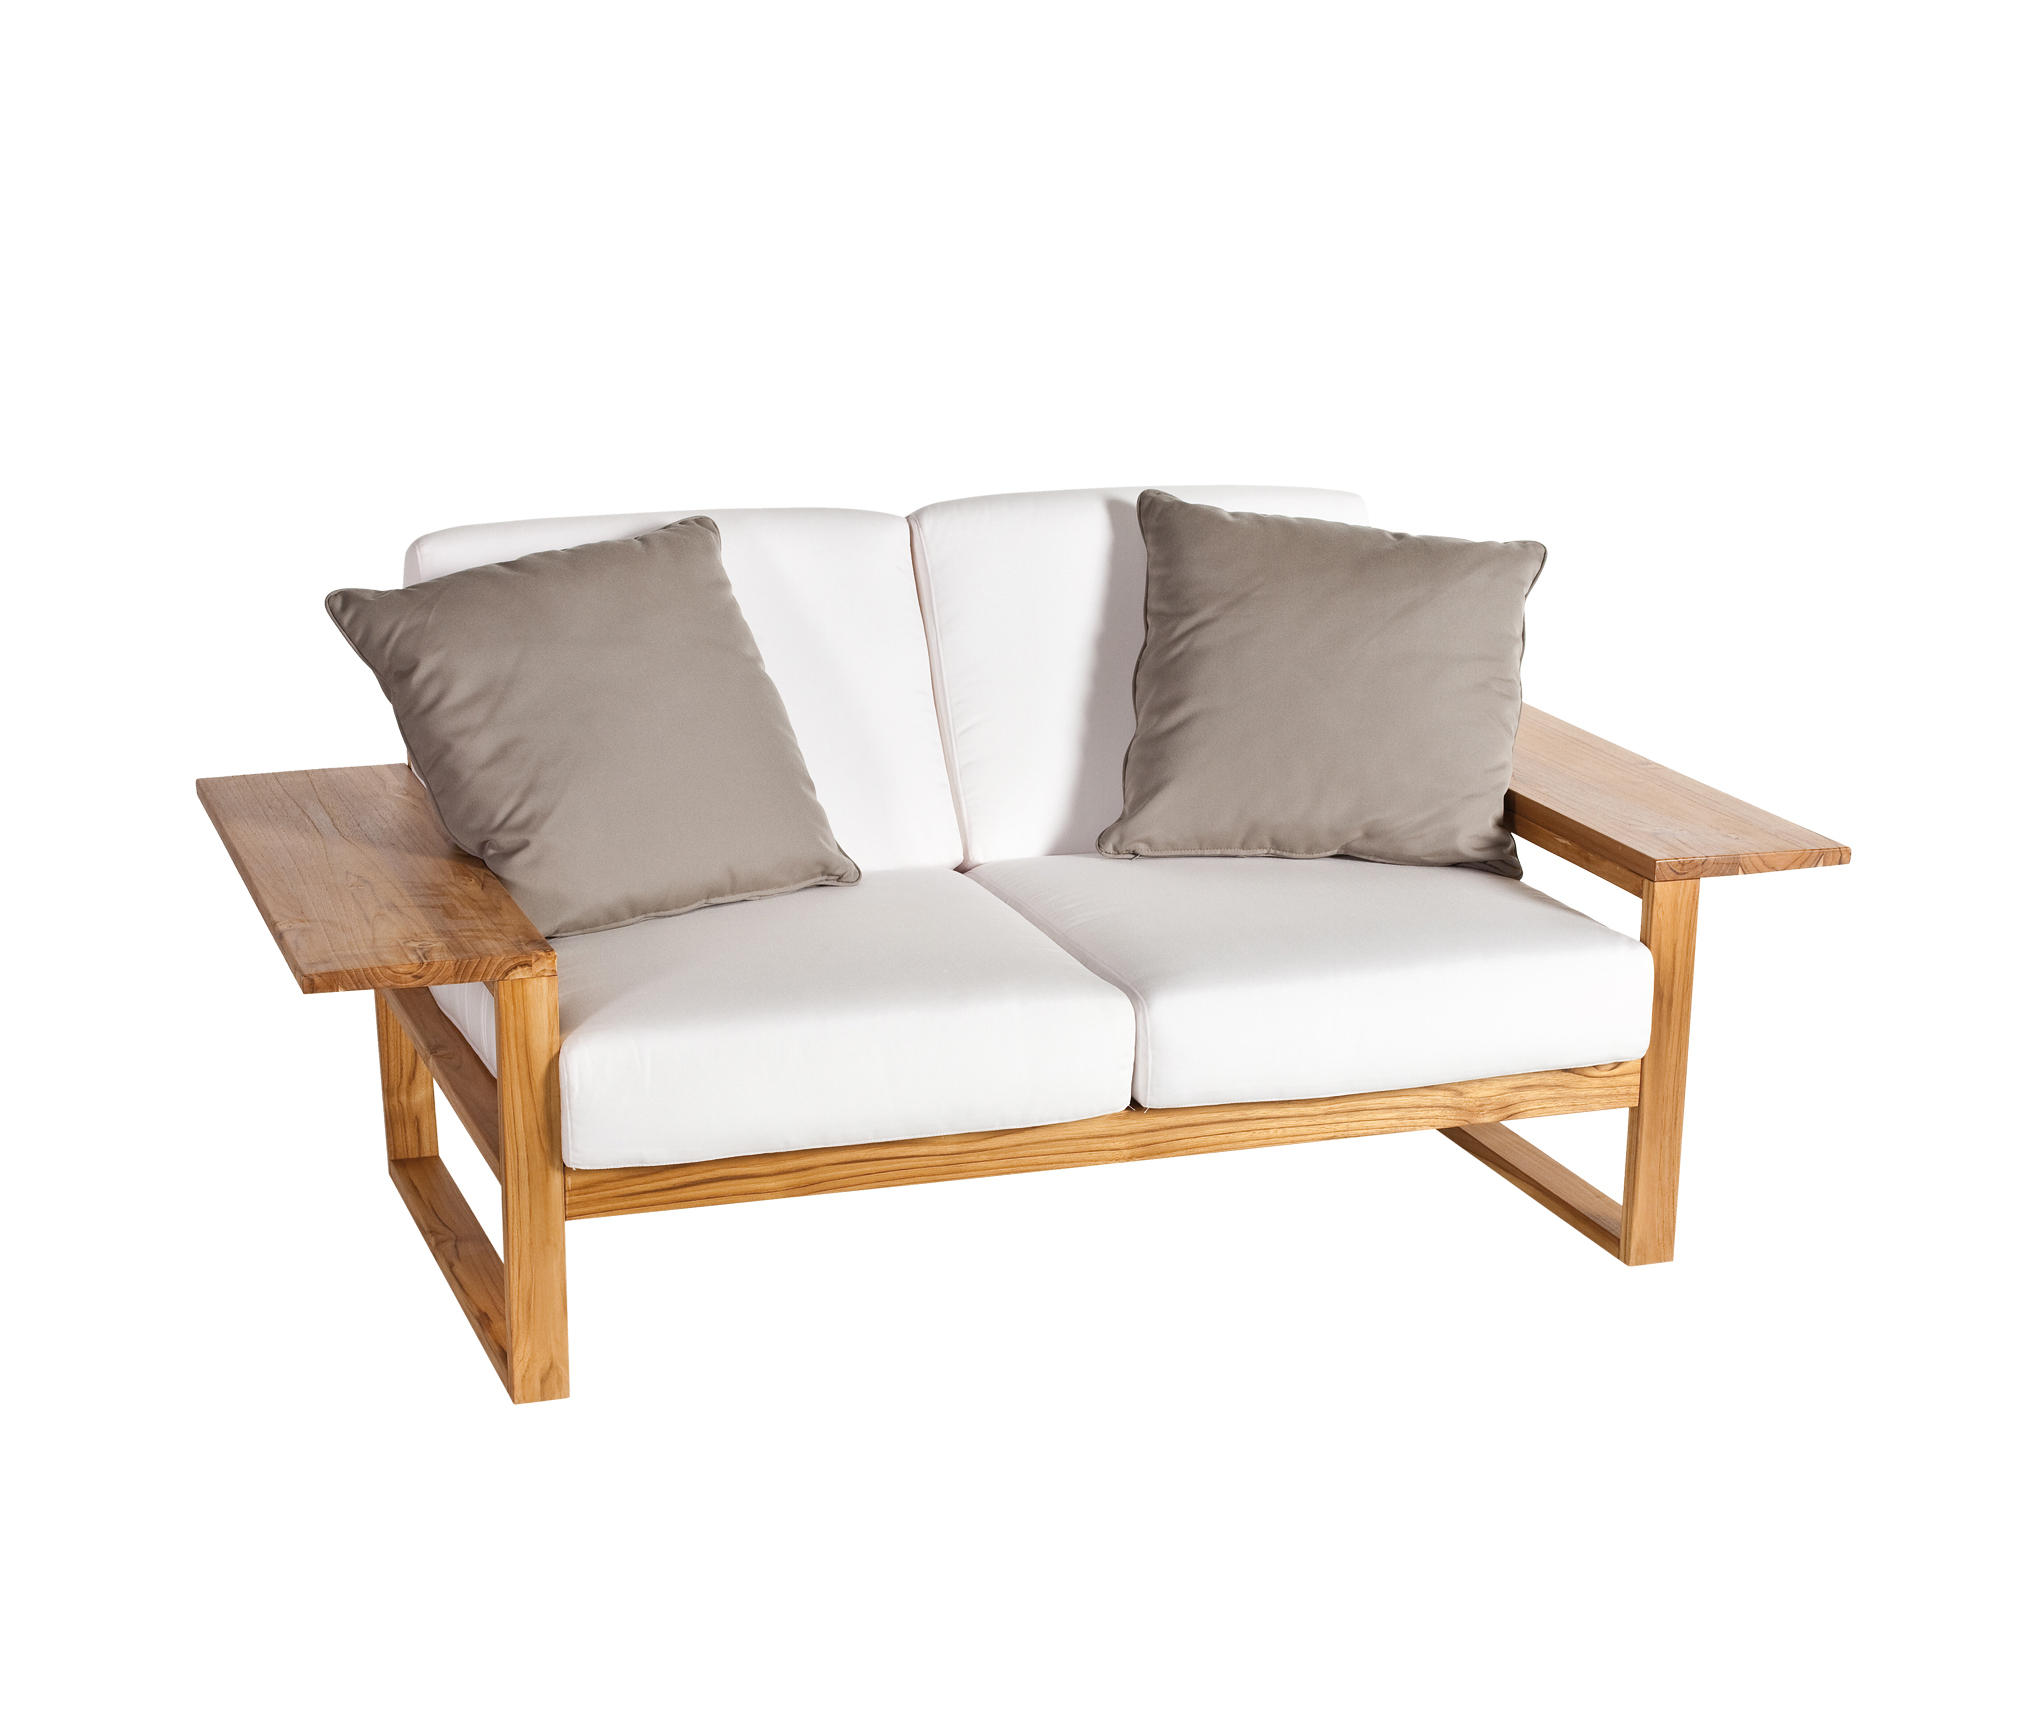 Lineal sof 2 sof s de jard n de point architonic for Sofas para jardin